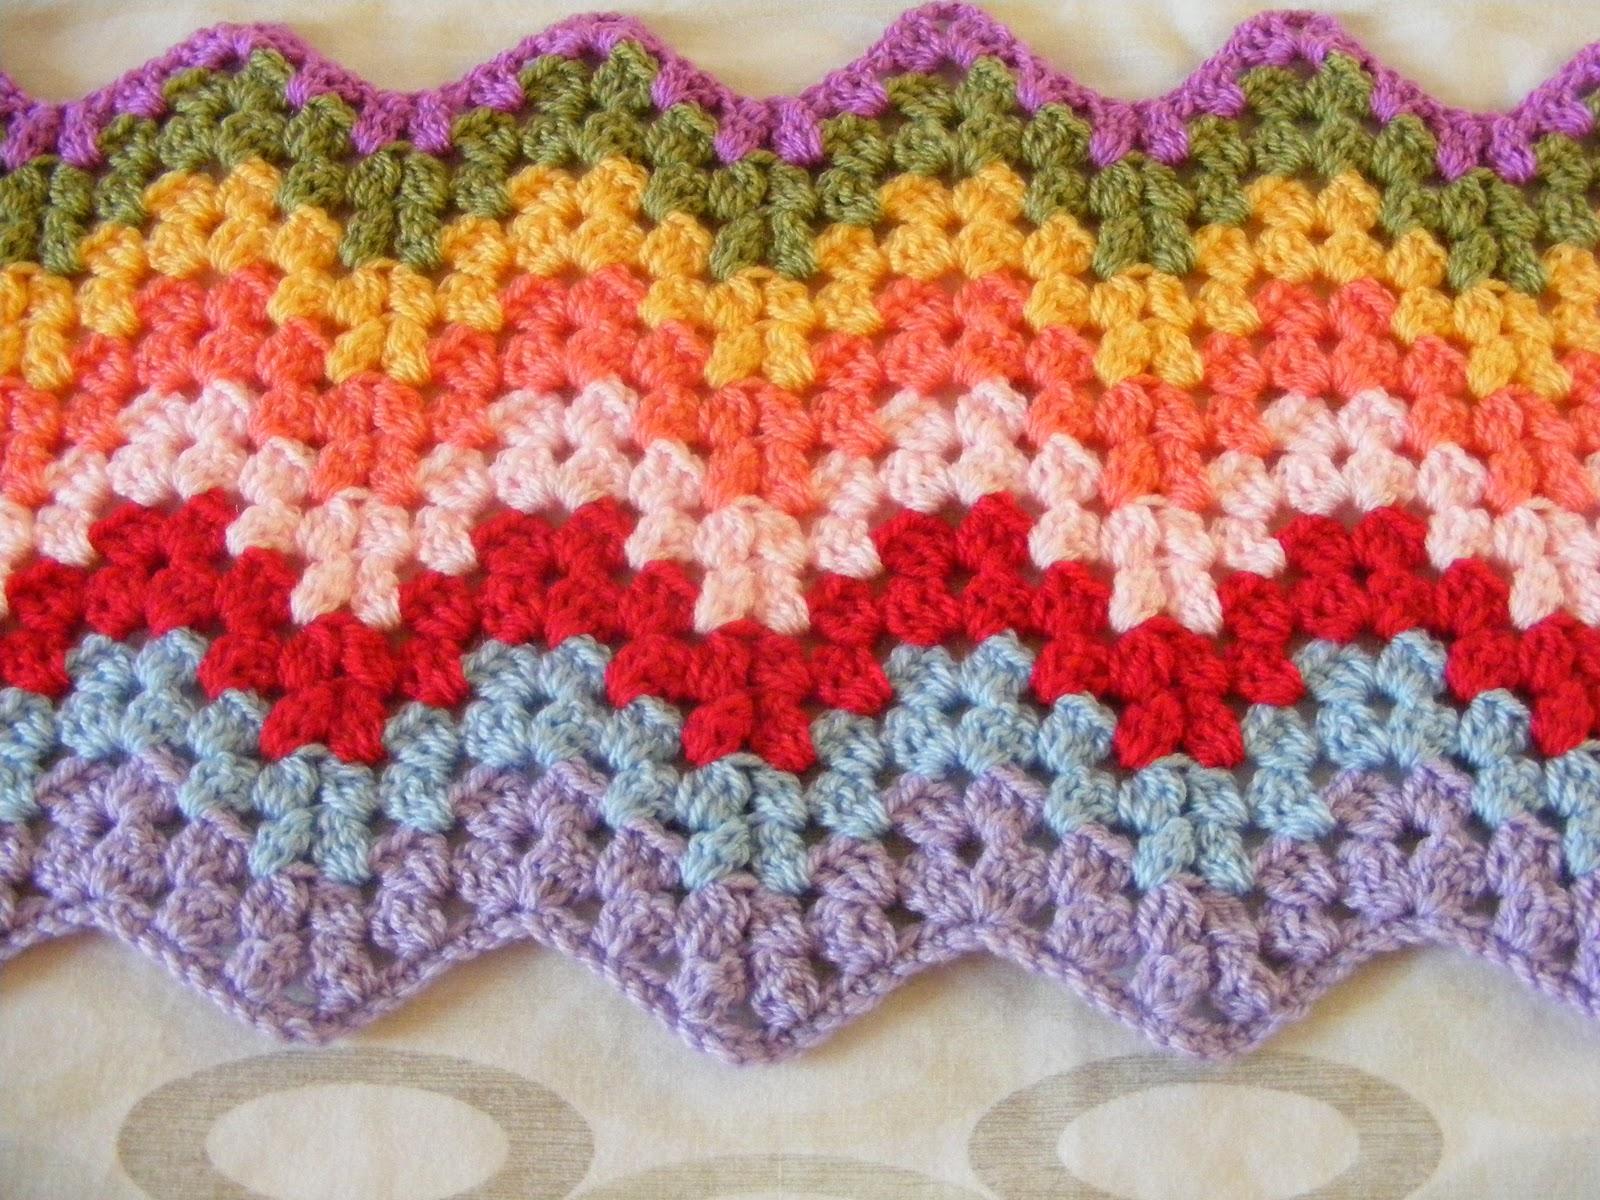 Granny Ripple Stitch Tutorial: Pinkfluffywarrior: Granny Ripple